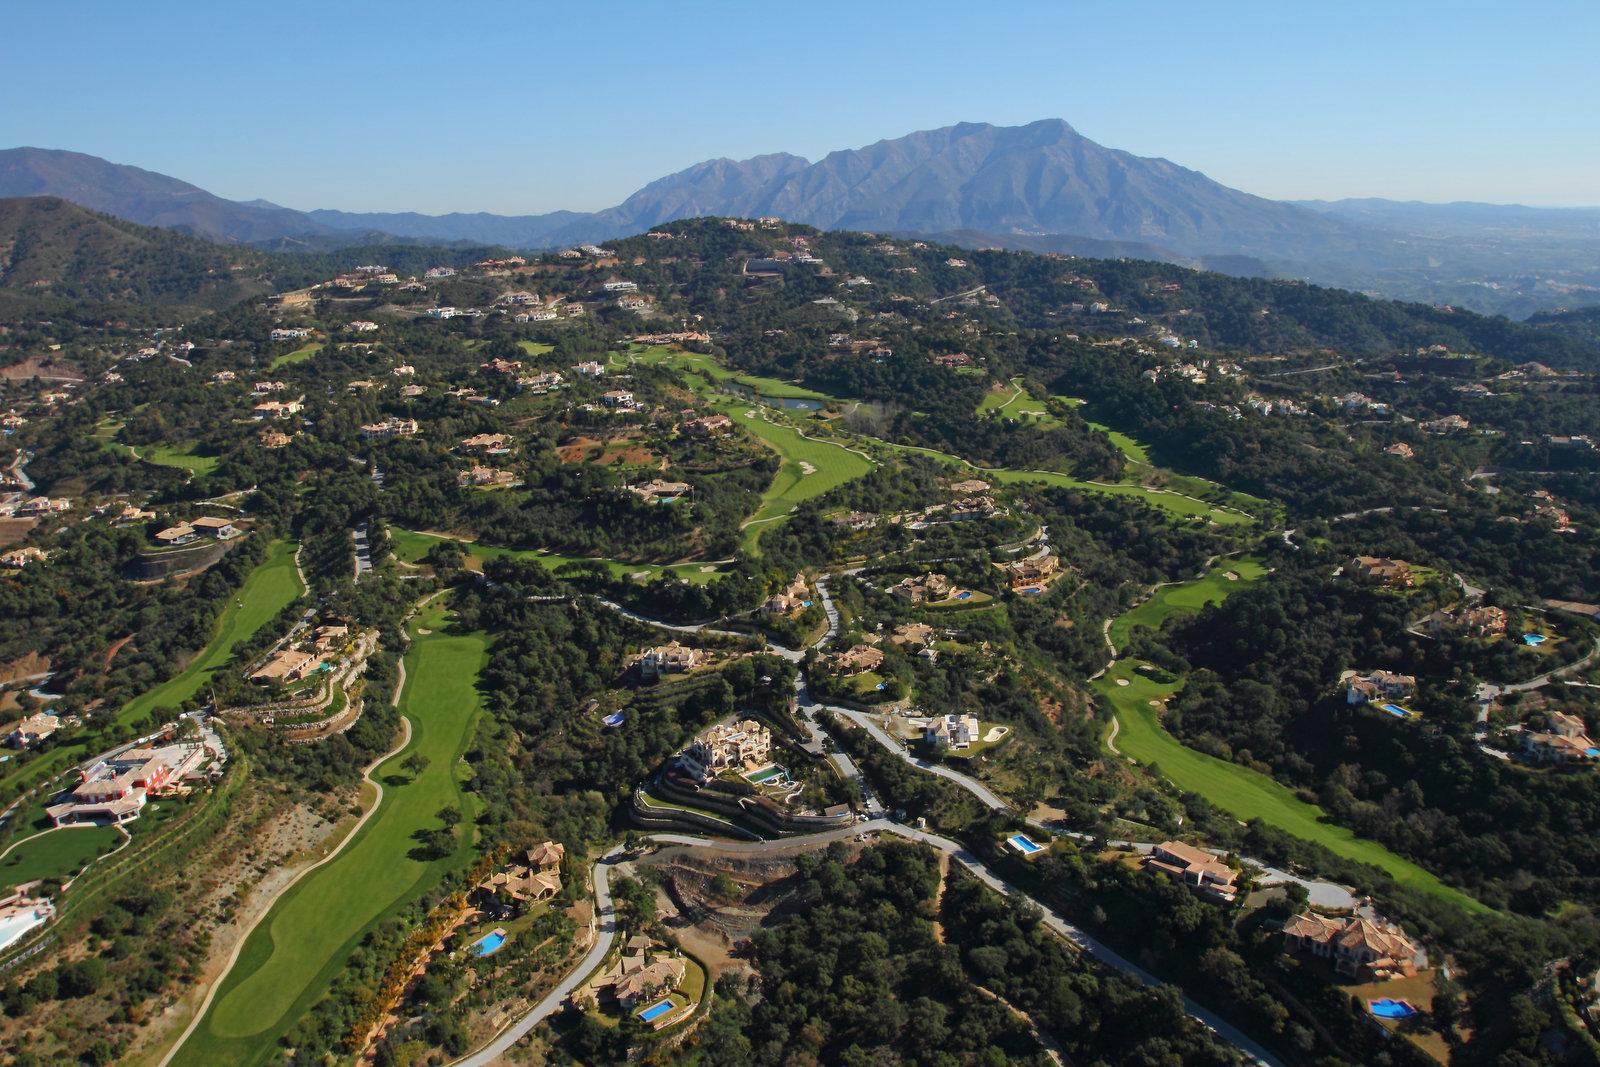 Why buy a property in La Zagaleta?